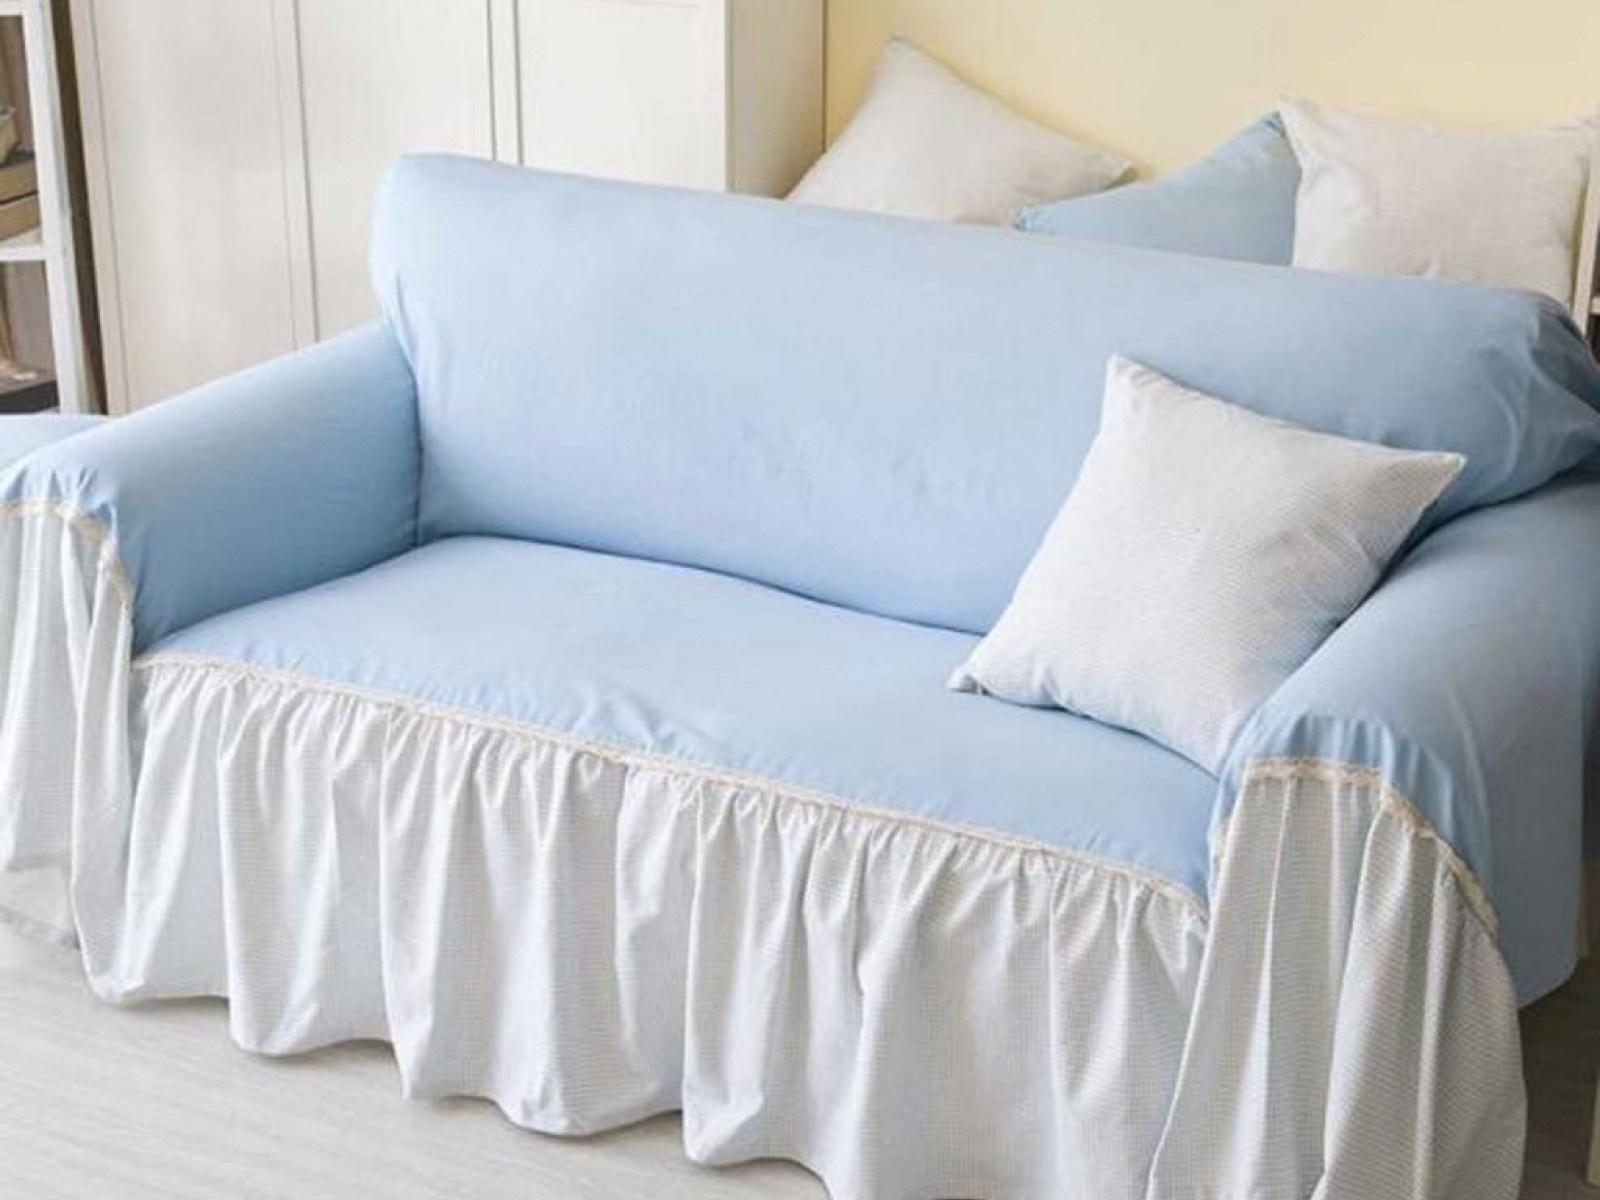 T Cushion Sofa Covers (Image 20 of 20)